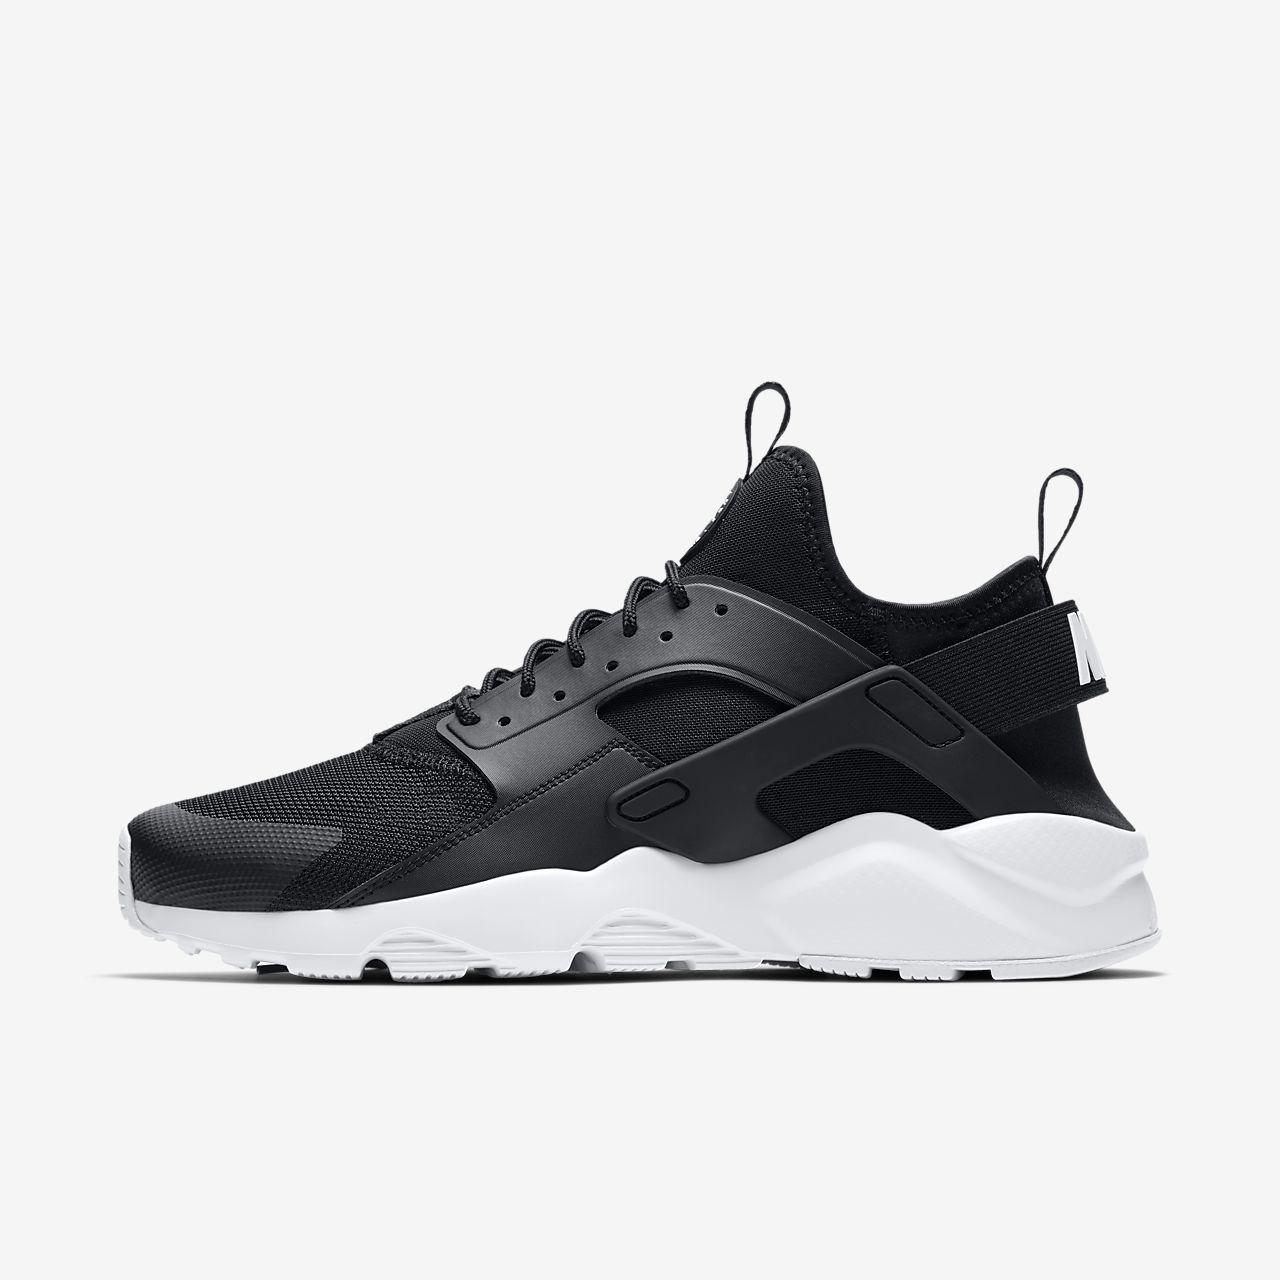 best sneakers 3b432 16ec2 ... Chaussure Nike Air Huarache Ultra pour Homme